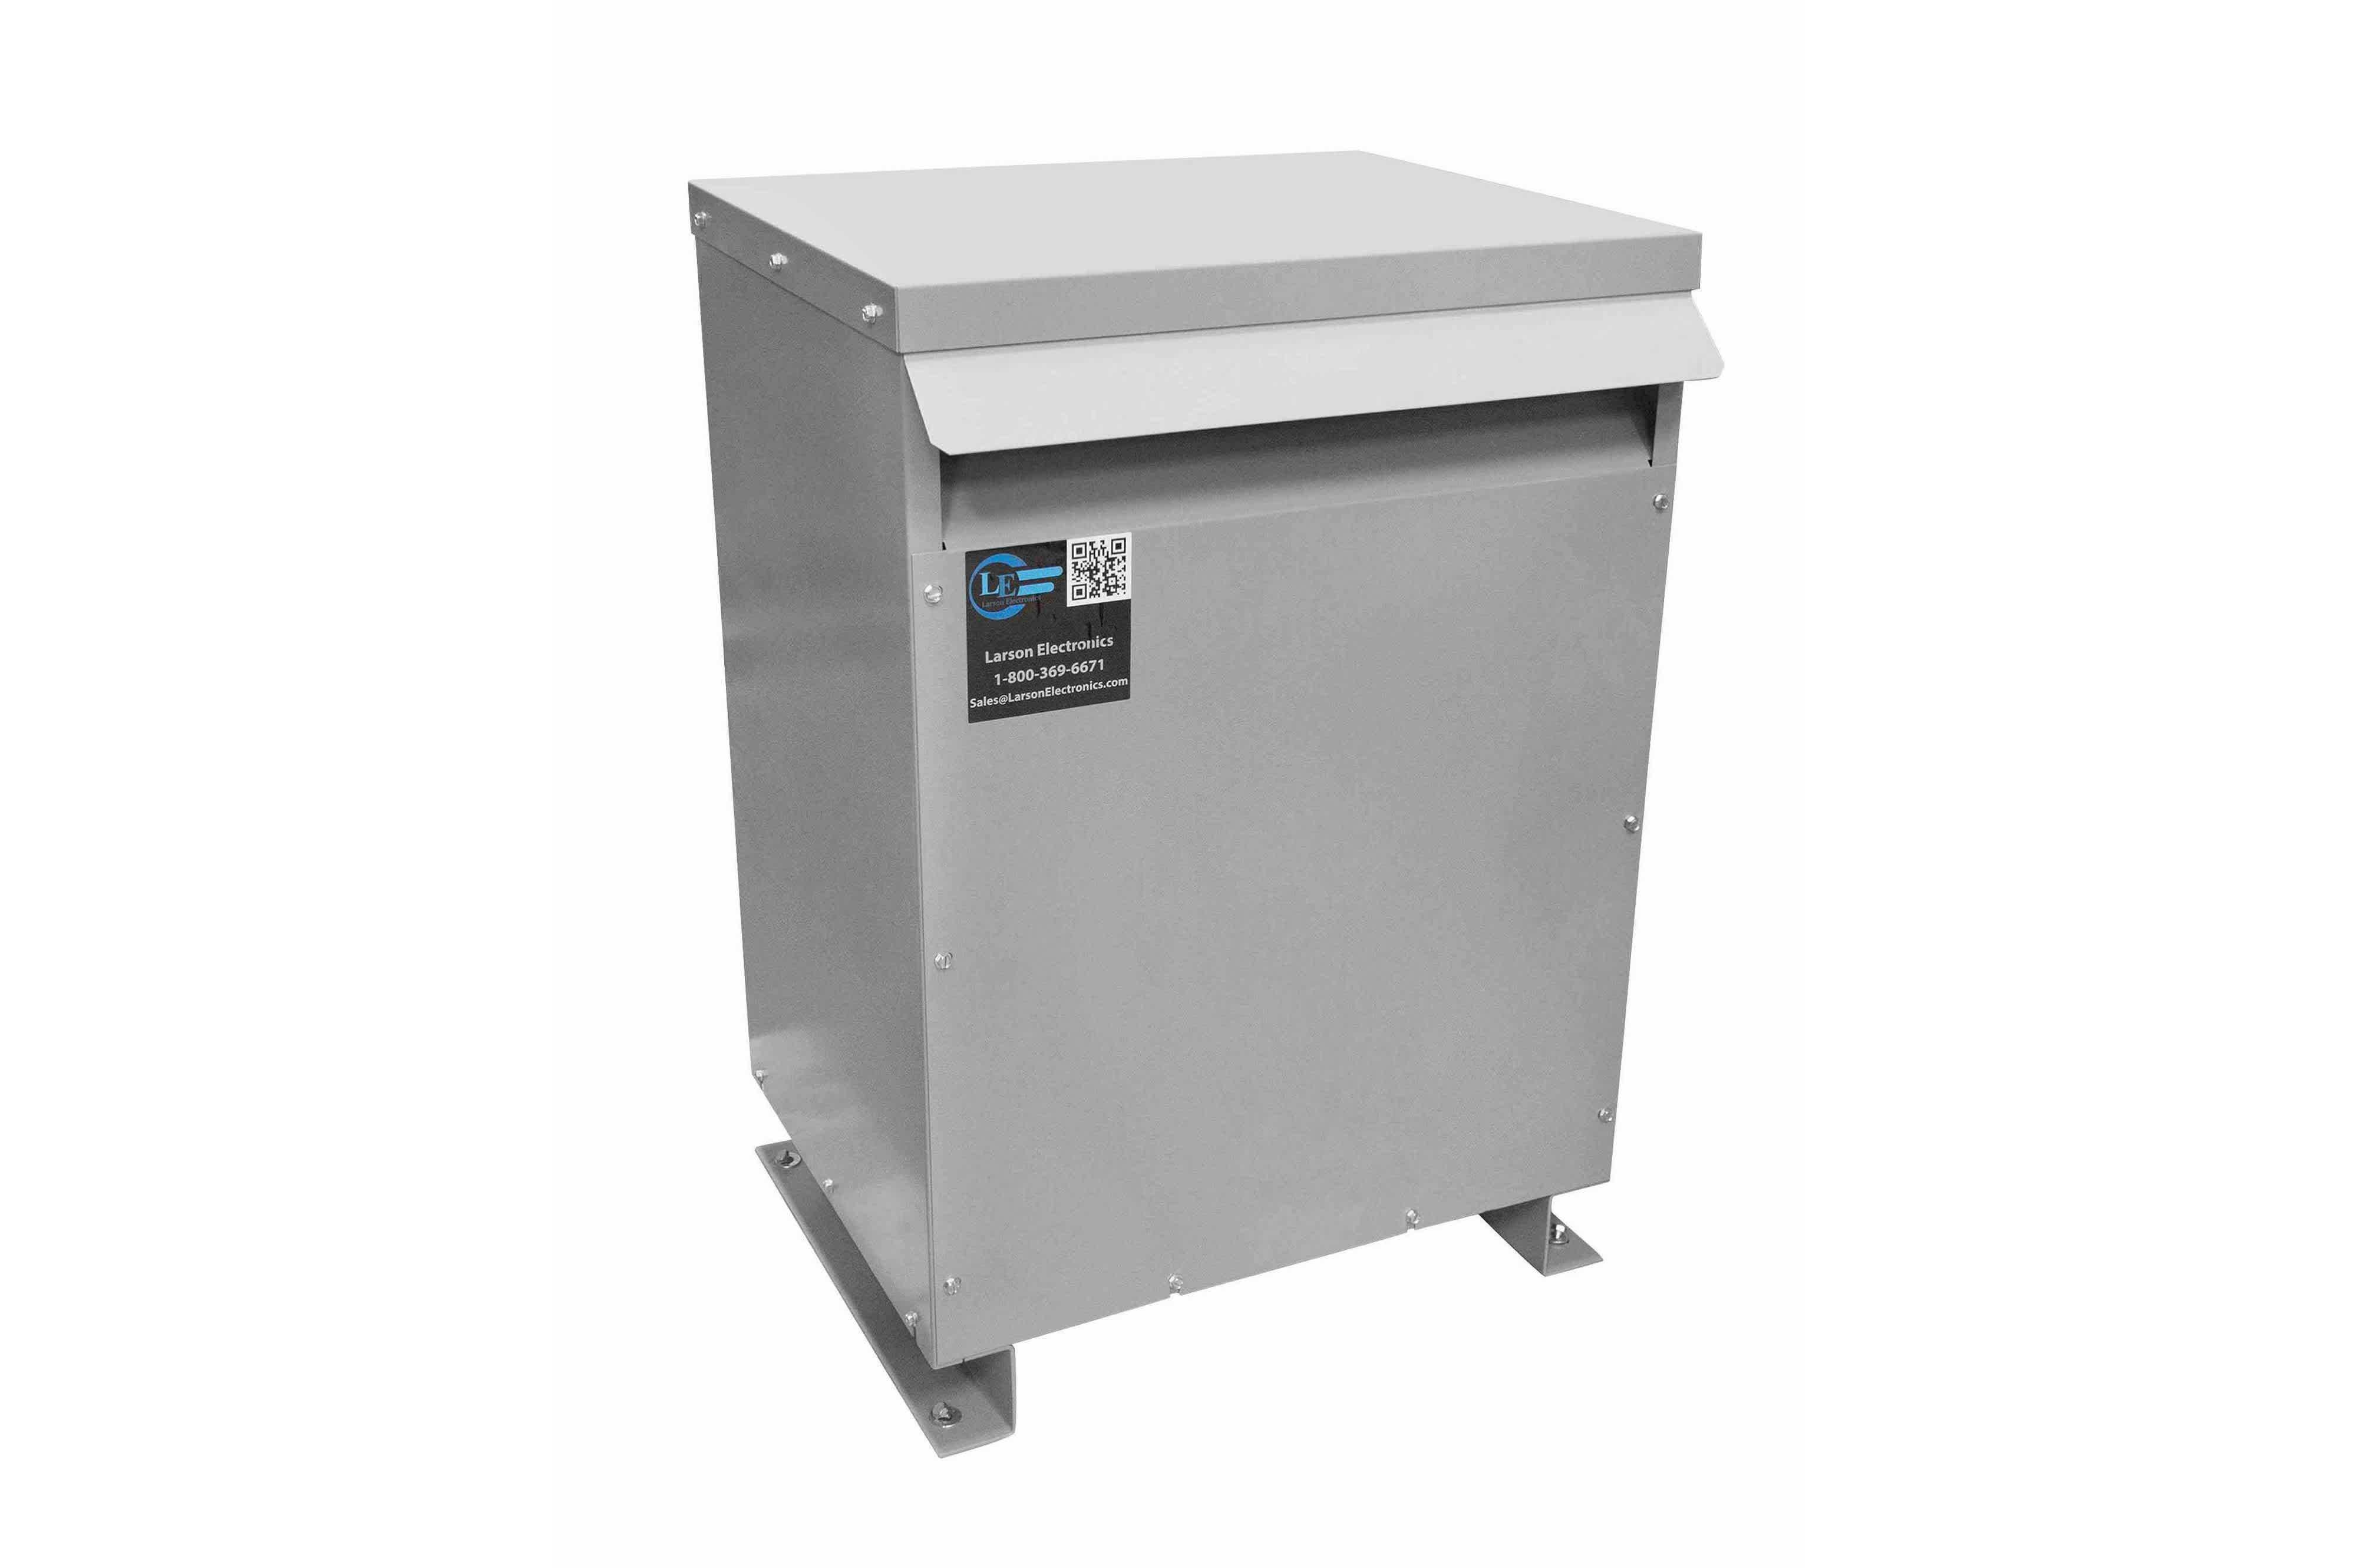 225 kVA 3PH Isolation Transformer, 380V Wye Primary, 240V/120 Delta Secondary, N3R, Ventilated, 60 Hz